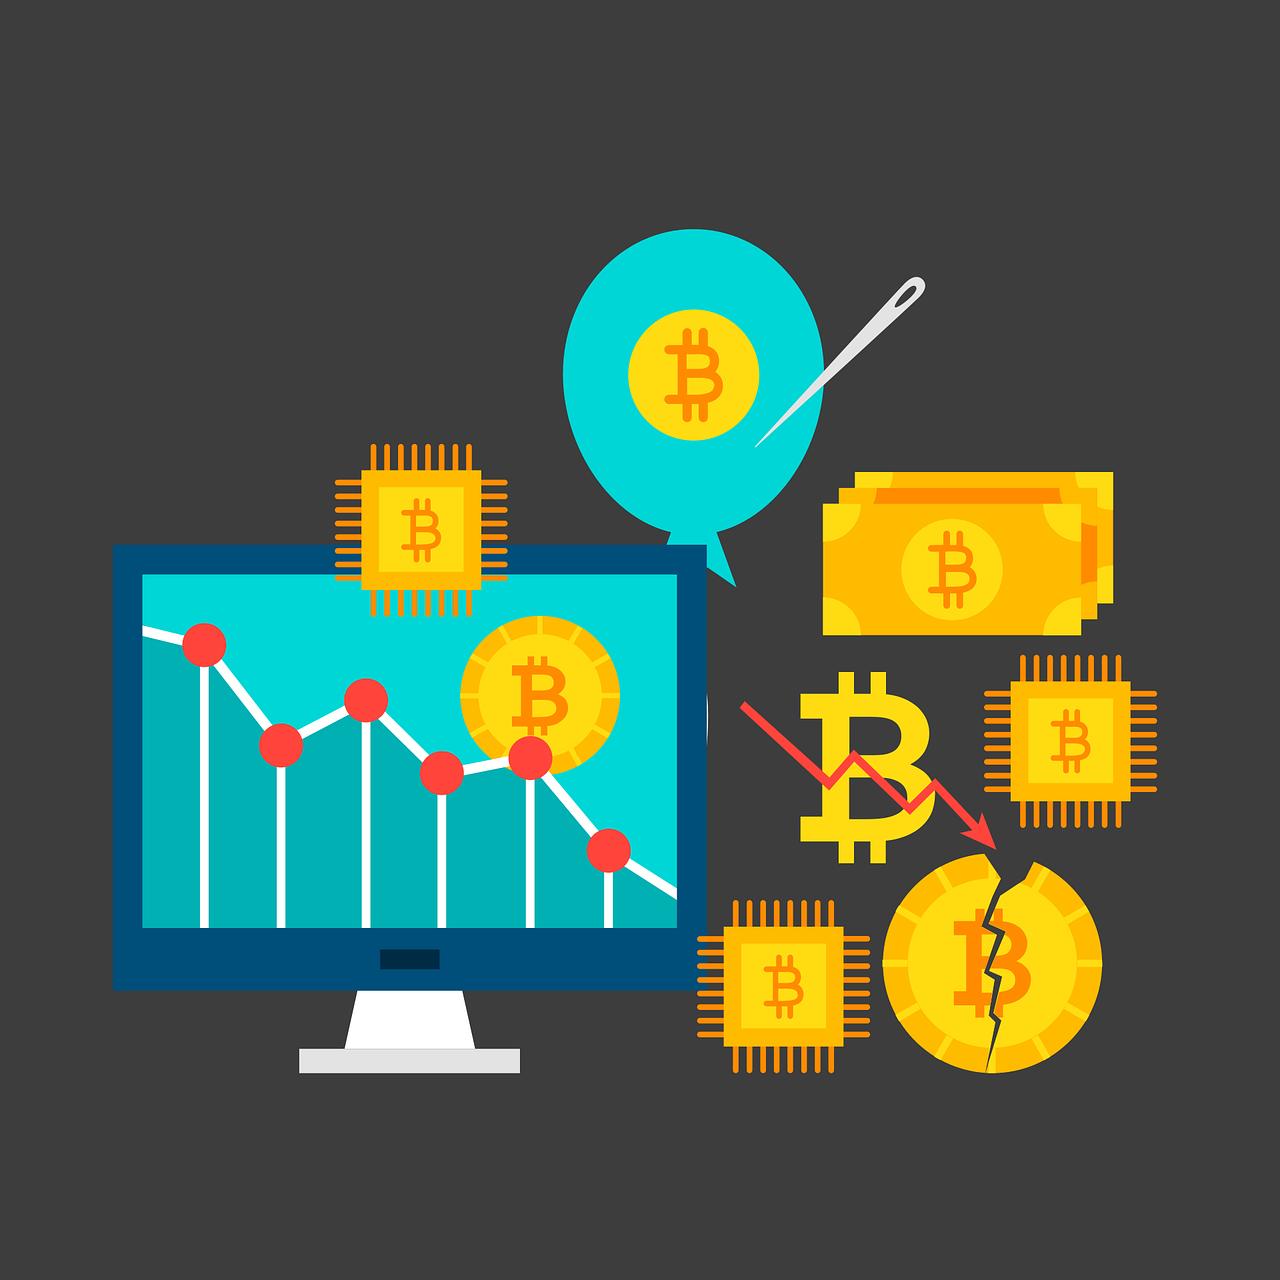 Bitcoin Node Network Marks An All-Time High After A Roller Coaster Journey